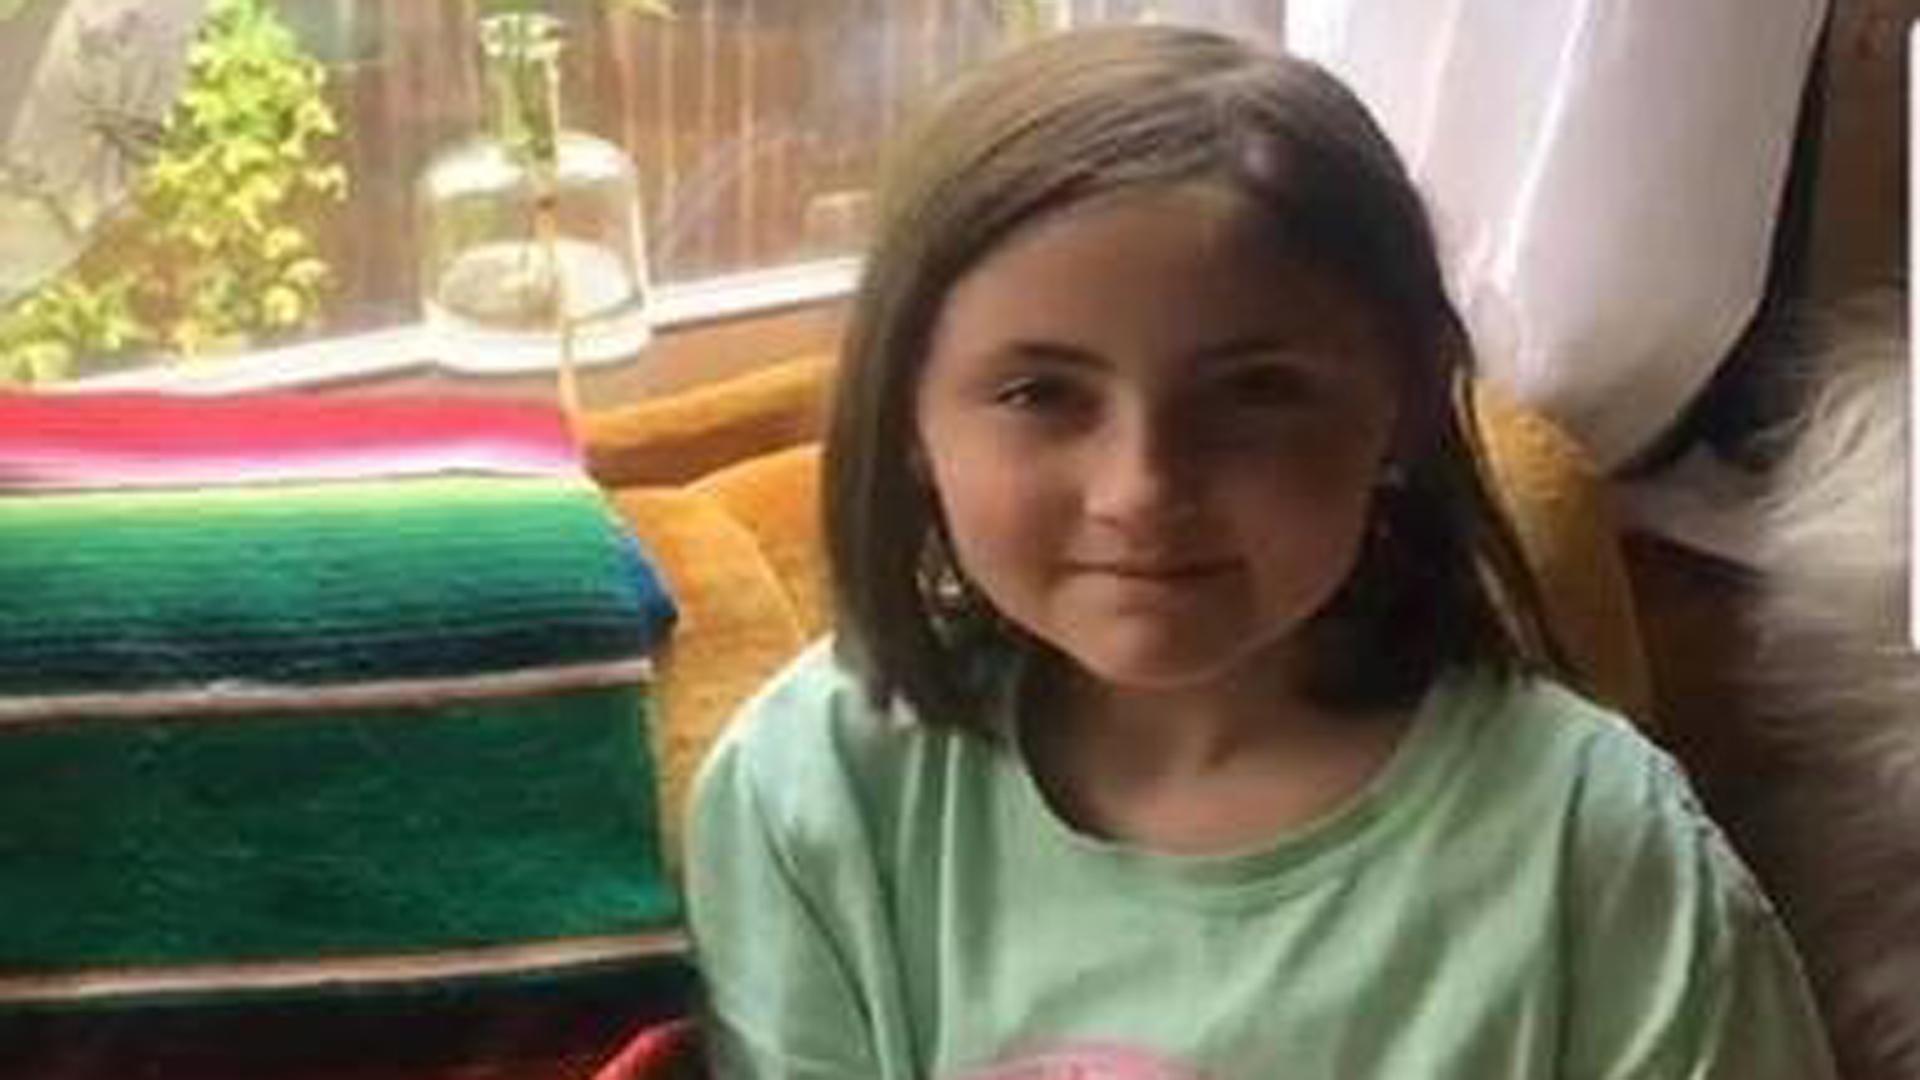 Salem Sabtka, 8, is seen in an undated photo. (Credit: Fort Worth PD/Facebook via CNN)